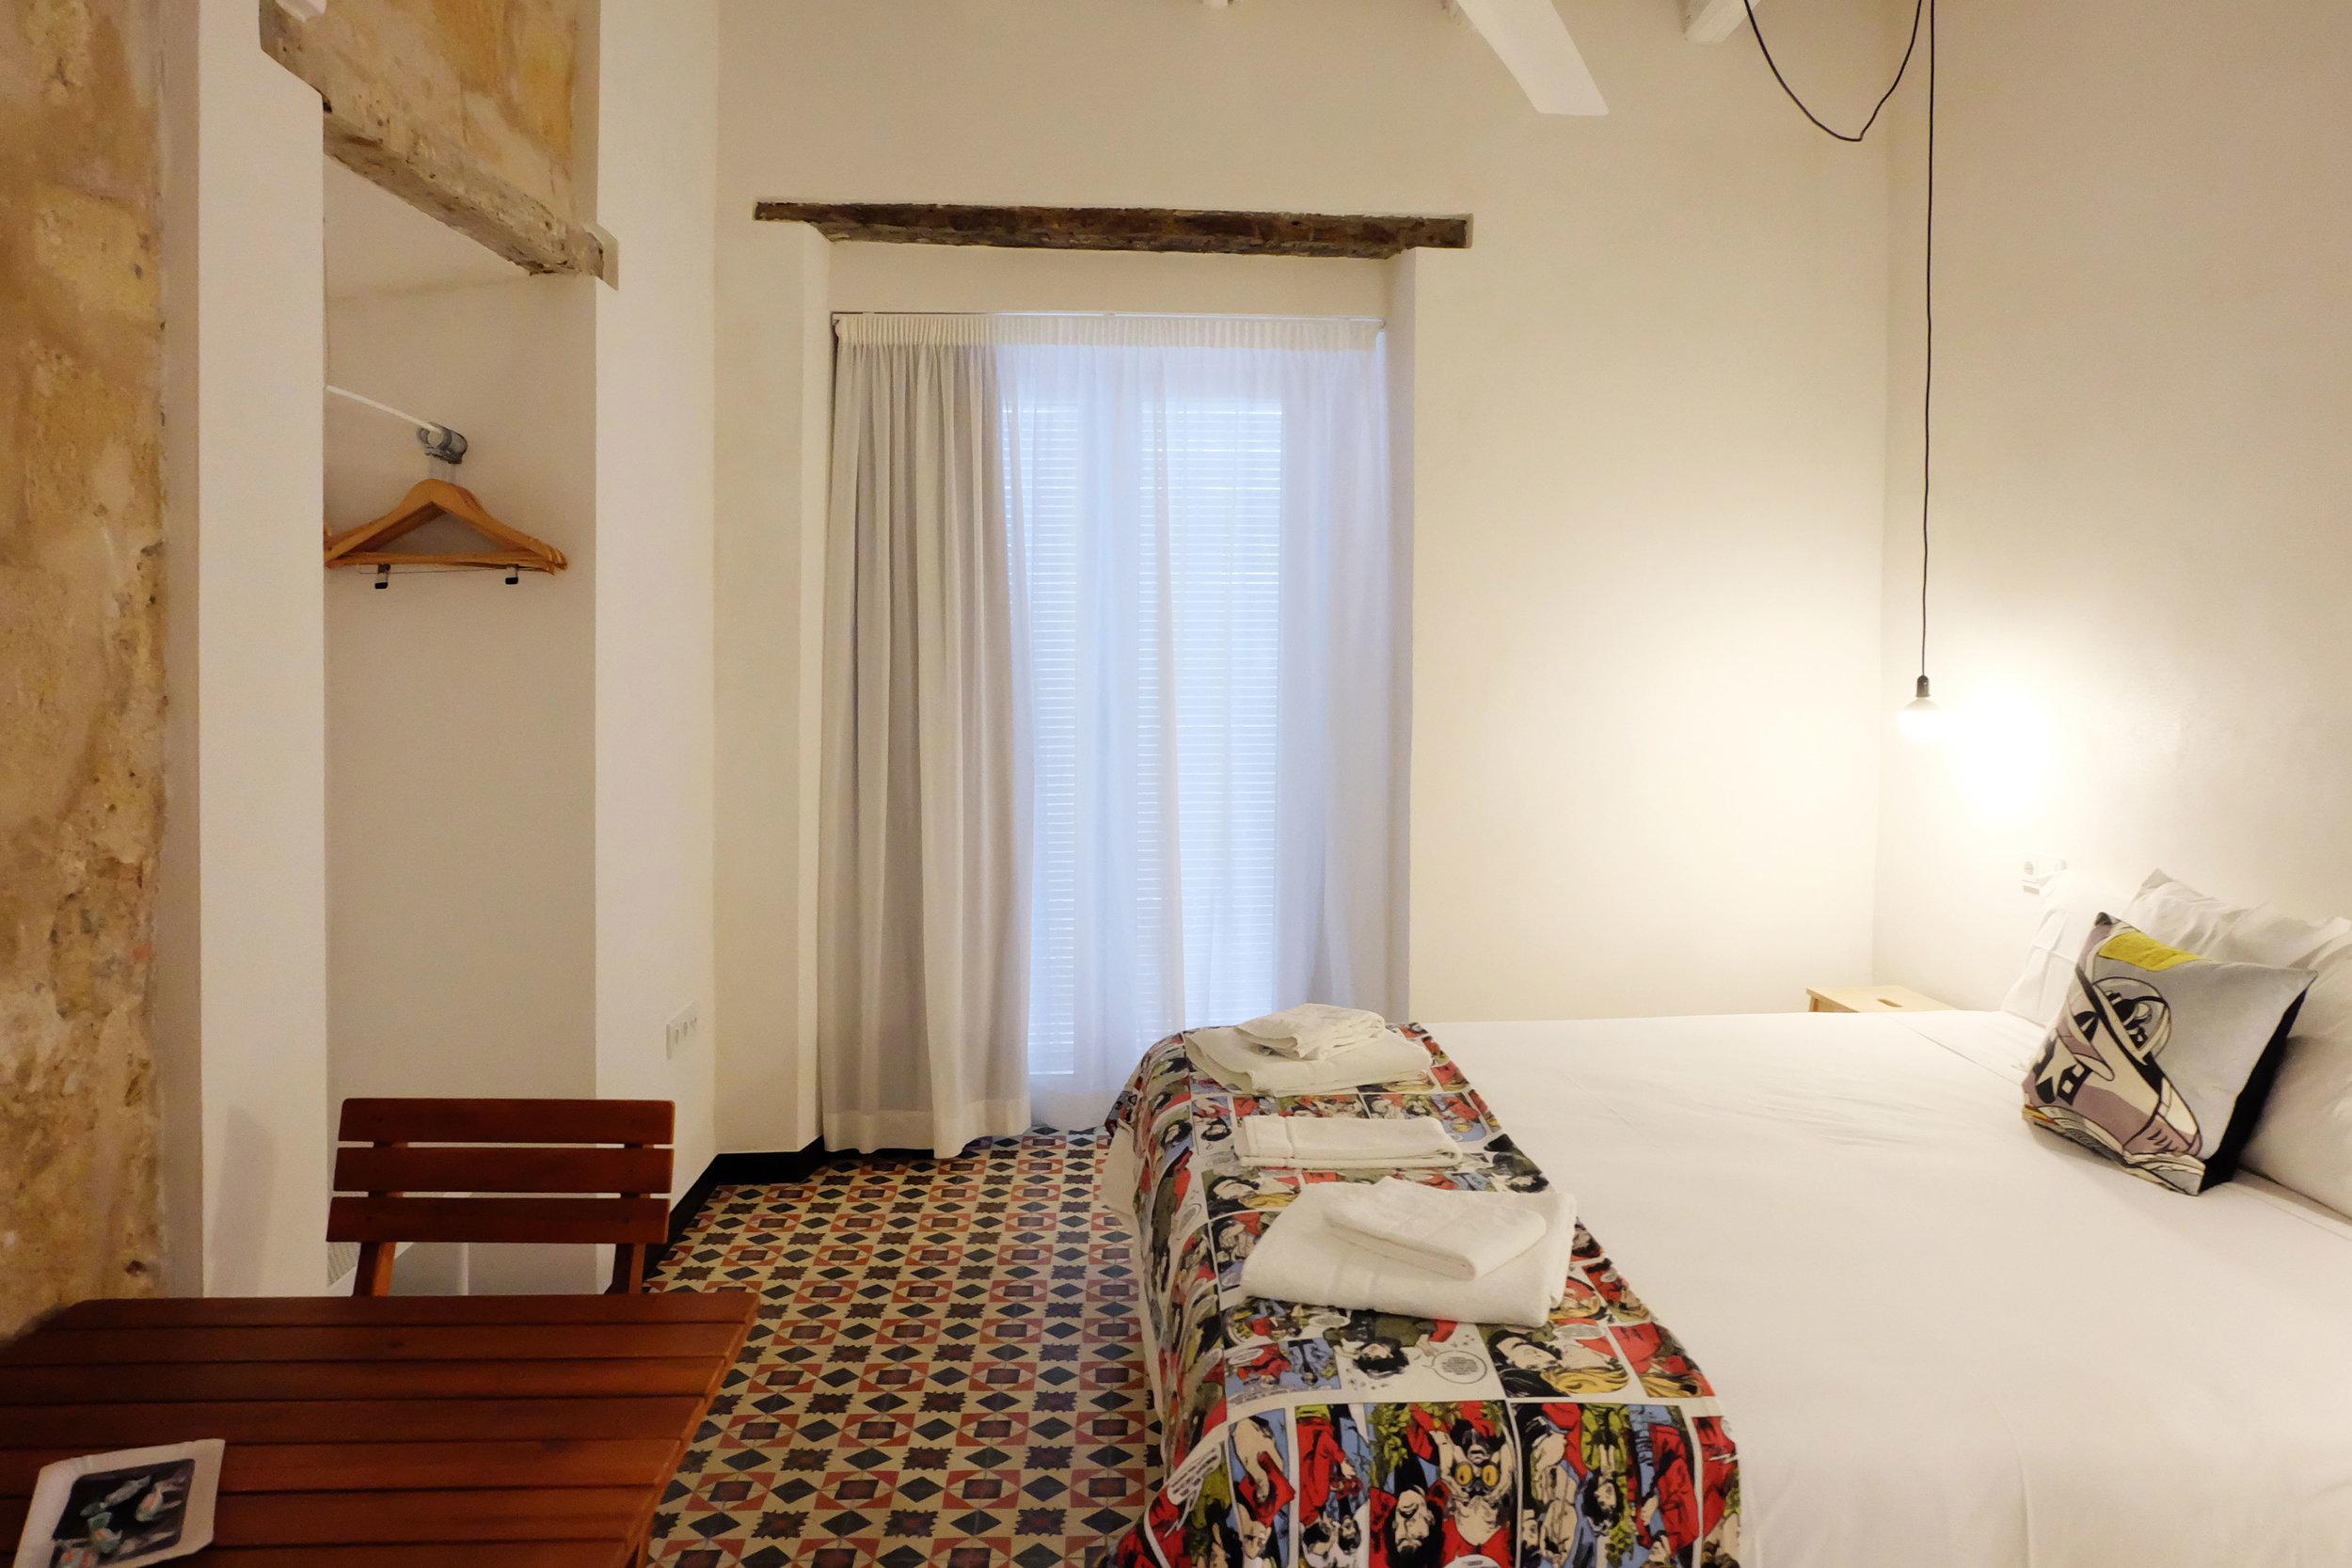 Hotel-Casa-de-Huespedes-Santa-Maria-Habitacion-1-6.jpg